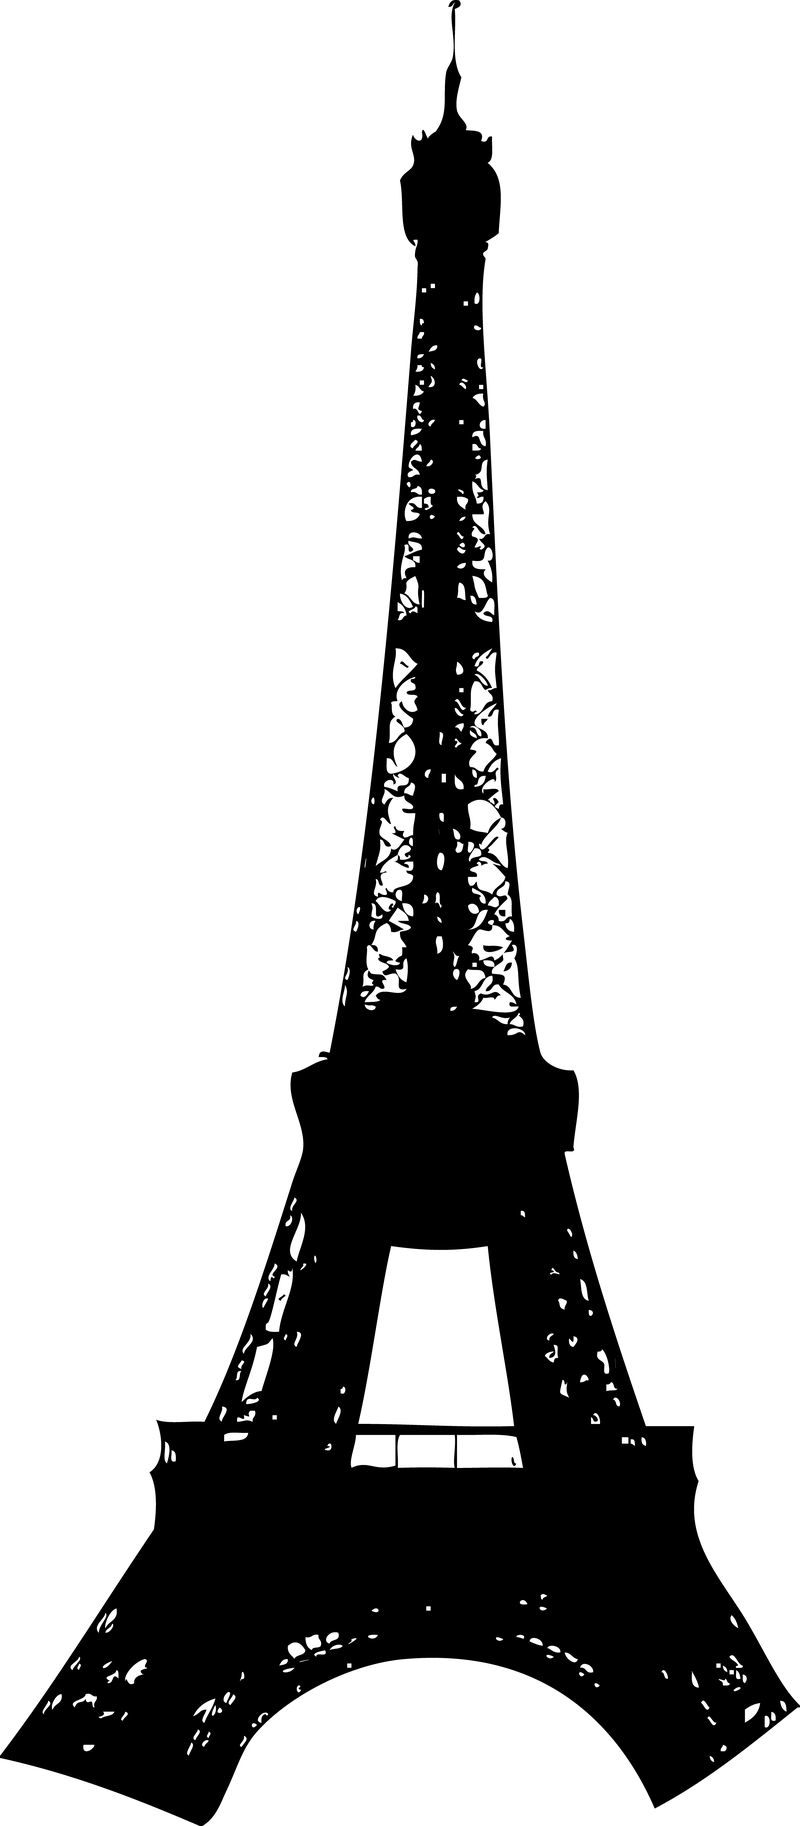 Download Free png Silueta de la torre Eiffel. D.